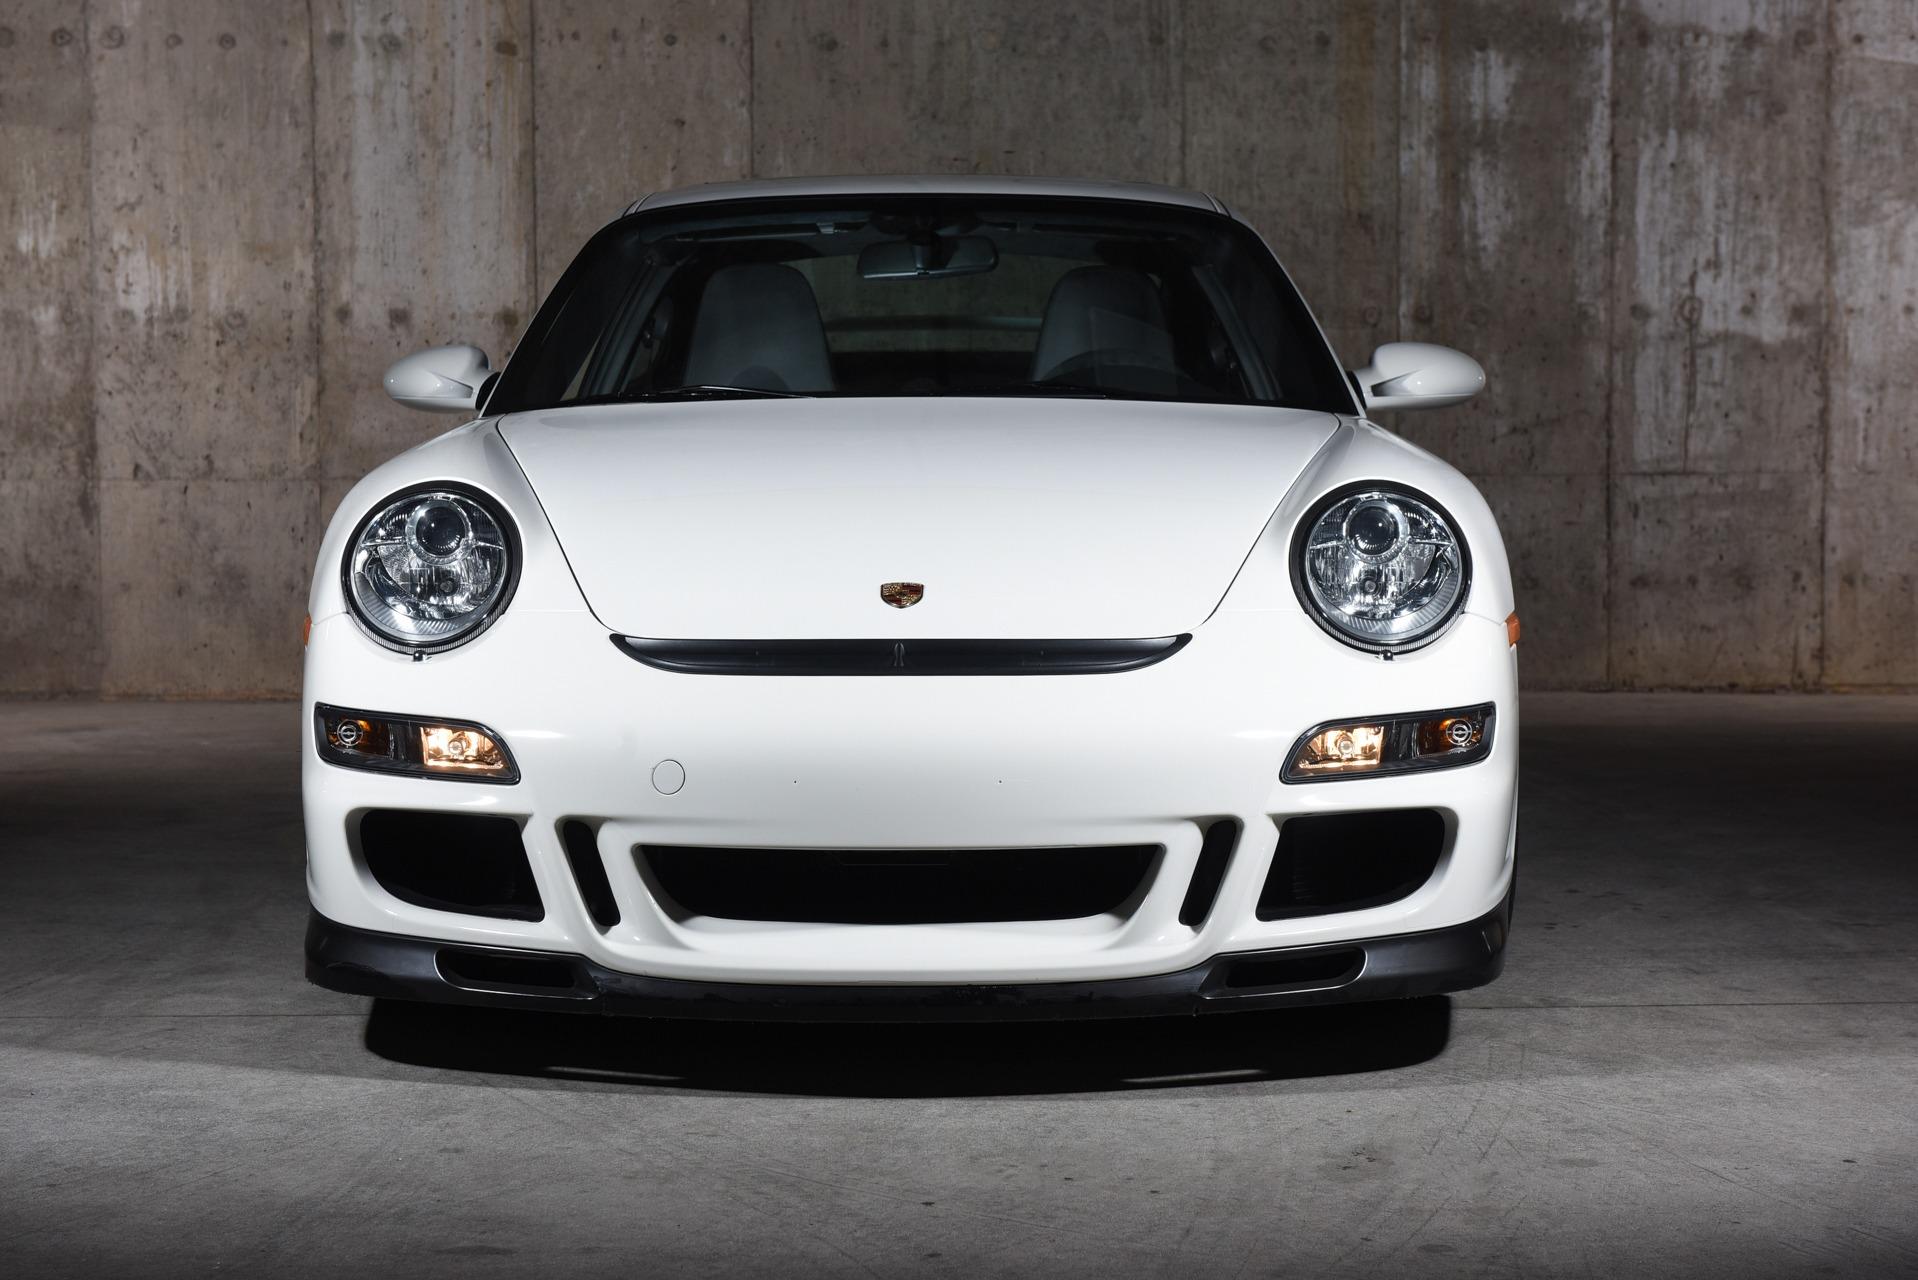 Used 2008 Porsche 911 GT3 | Glen Cove, NY